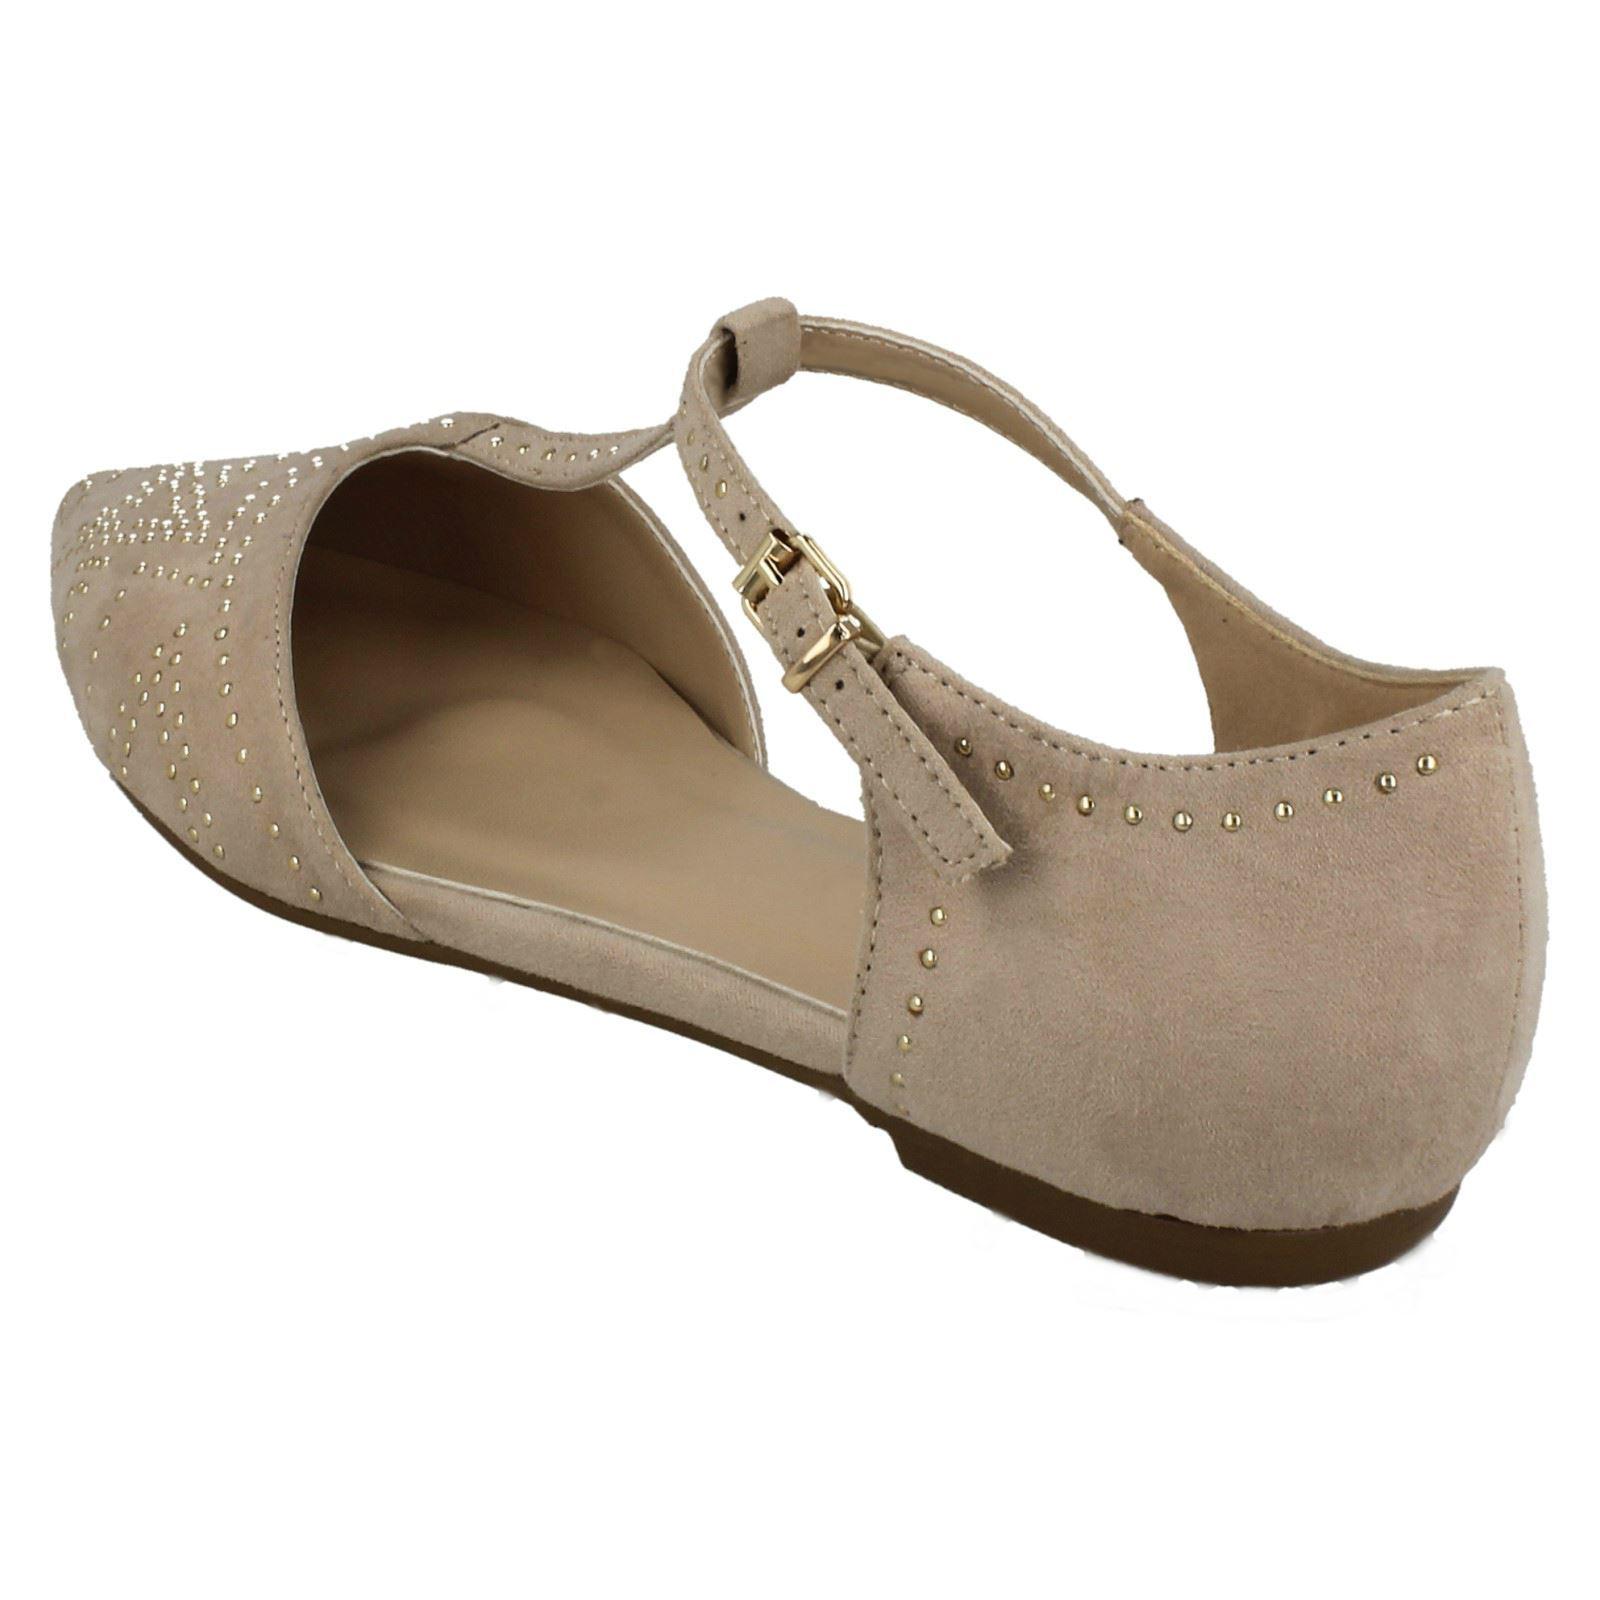 Ladies-Savannah-Flat-T-Bar-Buckle-Strap-Pointed-Shoes-F80232-D